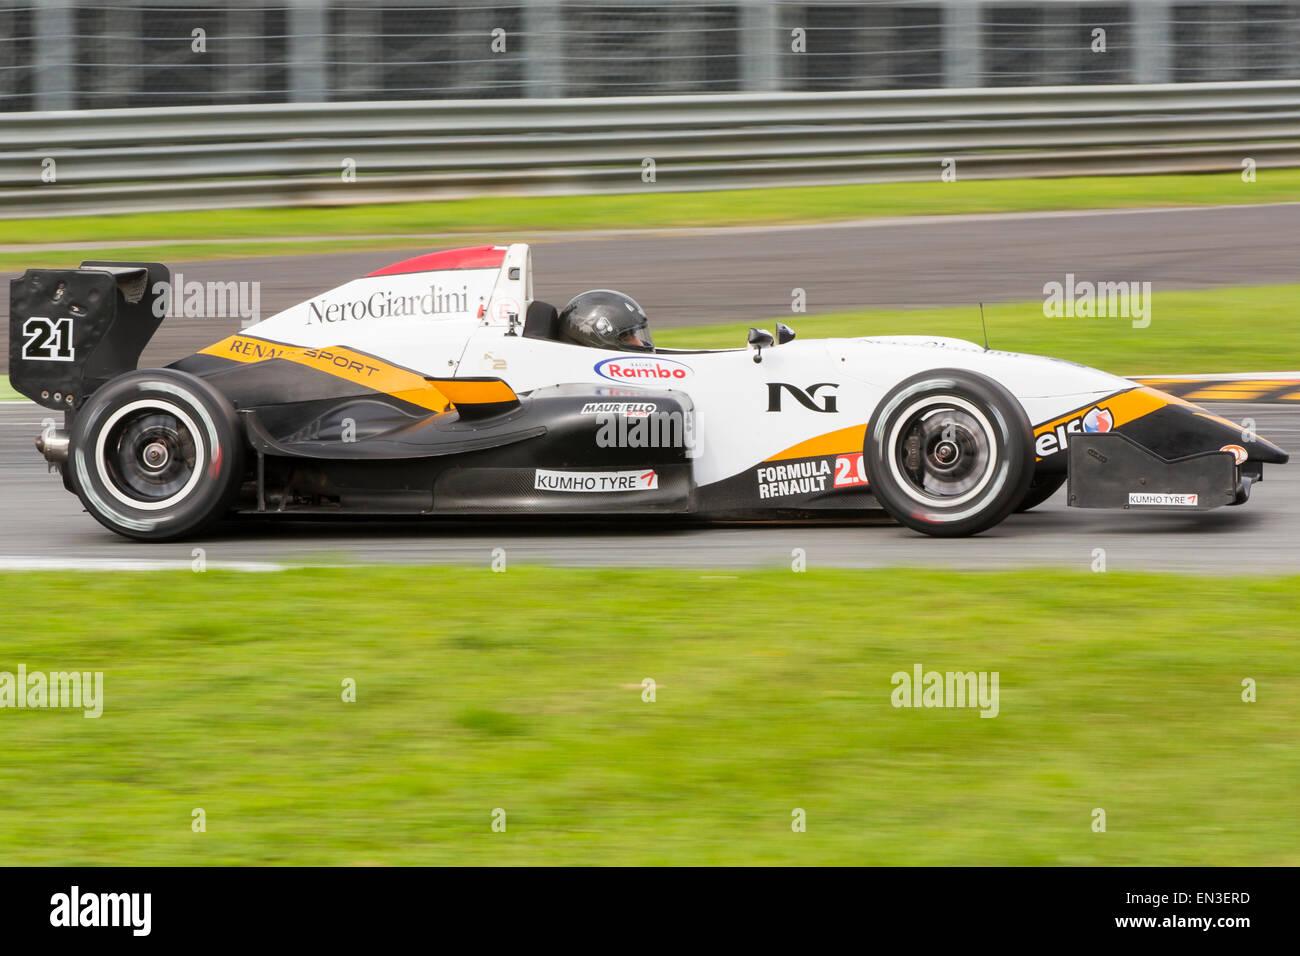 Circuit Monza Italia : Monza circuit stock photos monza circuit stock images alamy